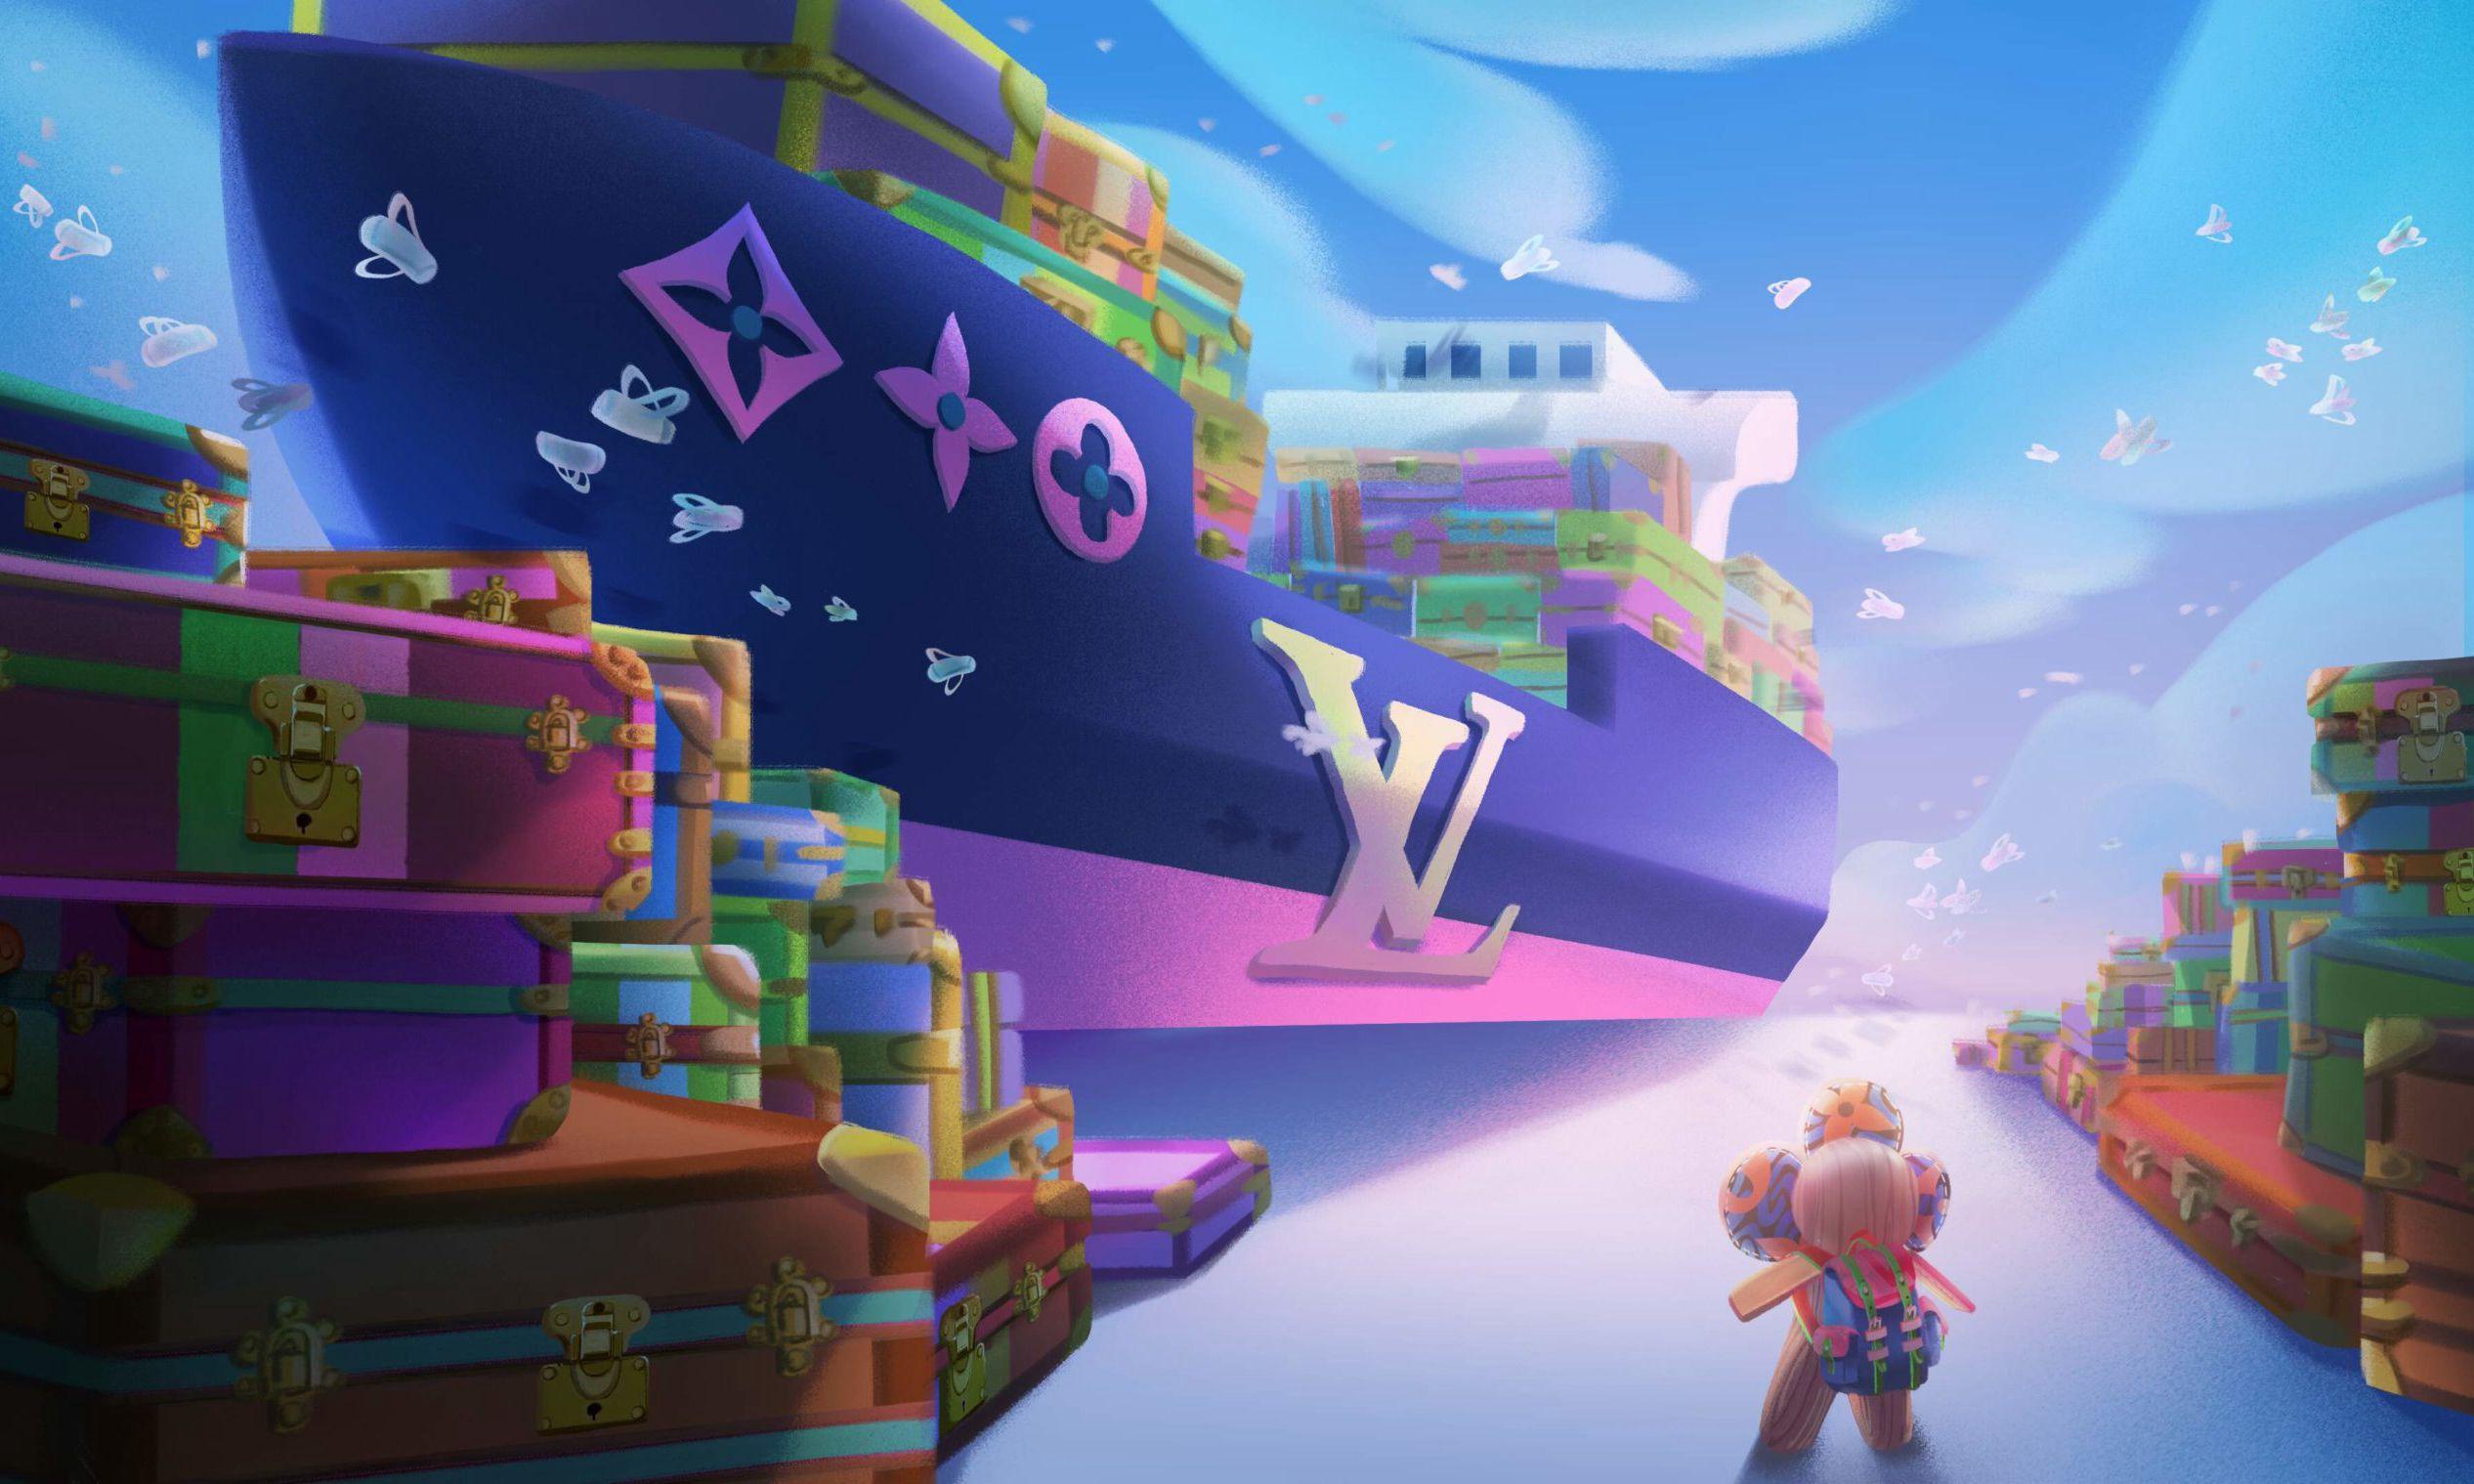 LV 推出新手游,真的是为了让玩家们「玩游戏」吗?